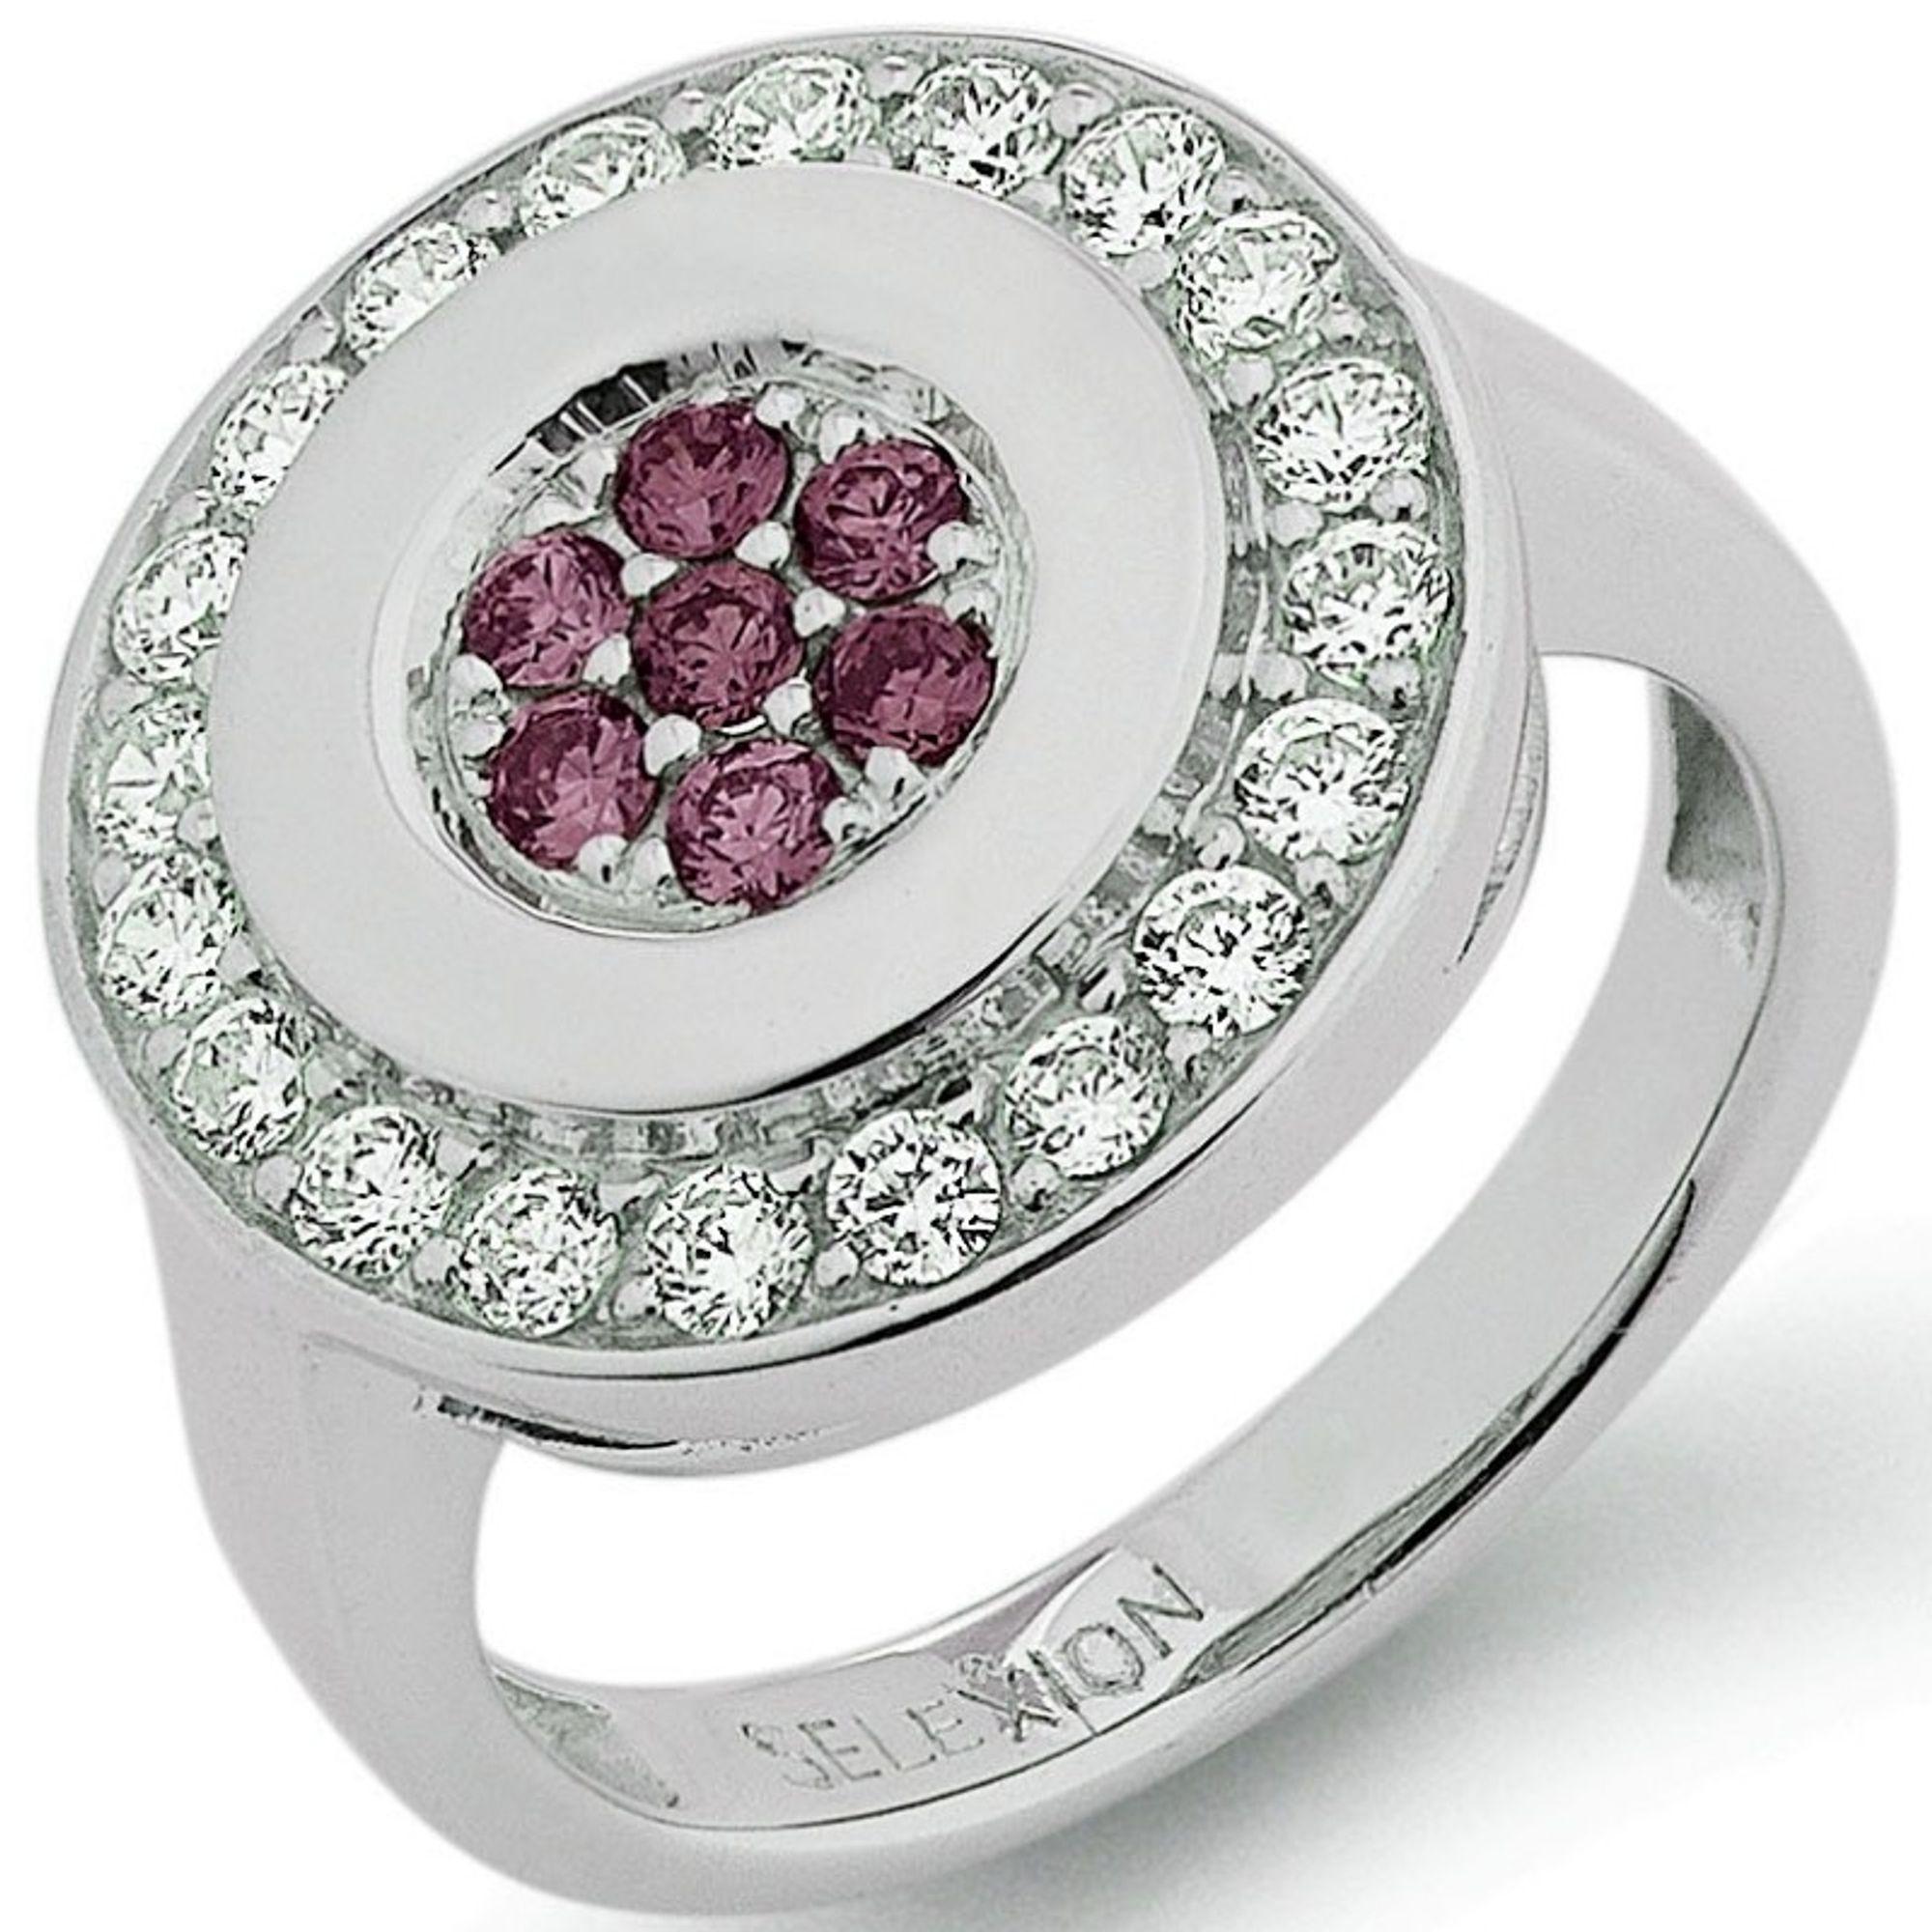 SELEXION 53EX750 Damen Ring Silber lila 54 (17.2)